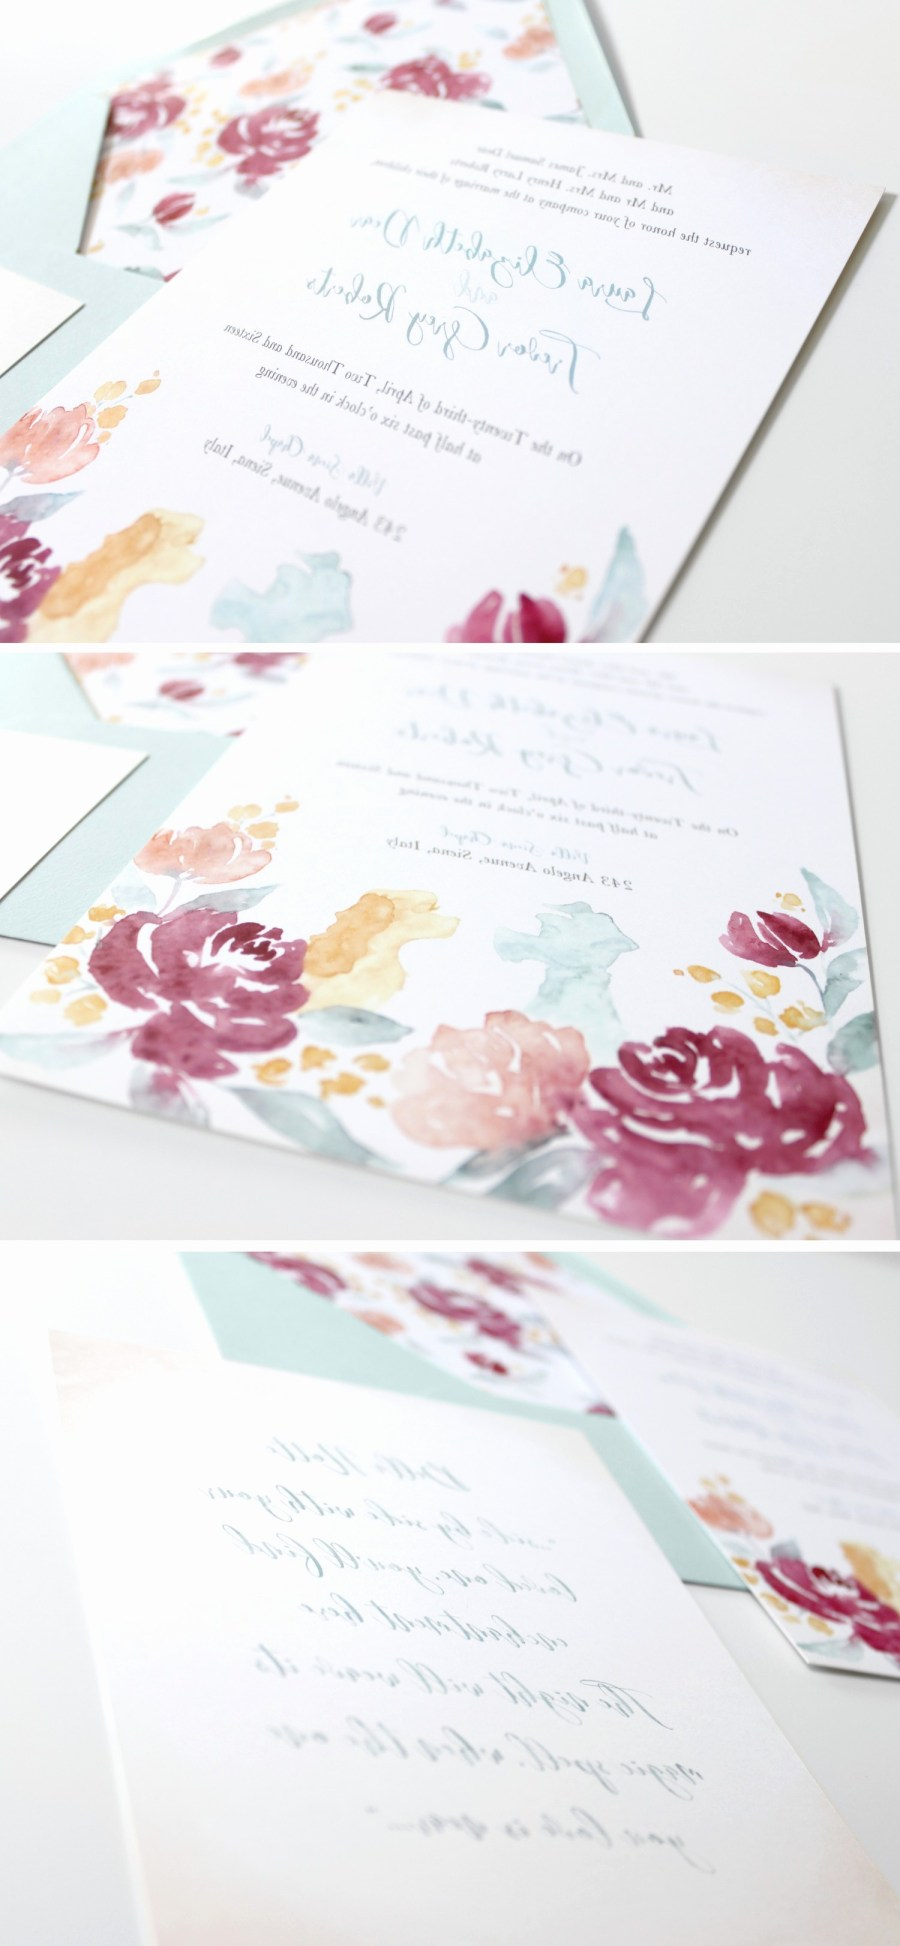 Disney Themed Wedding Invitations Lovely Cinderella Themed Wedding Invitations Wedding Theme Ideas